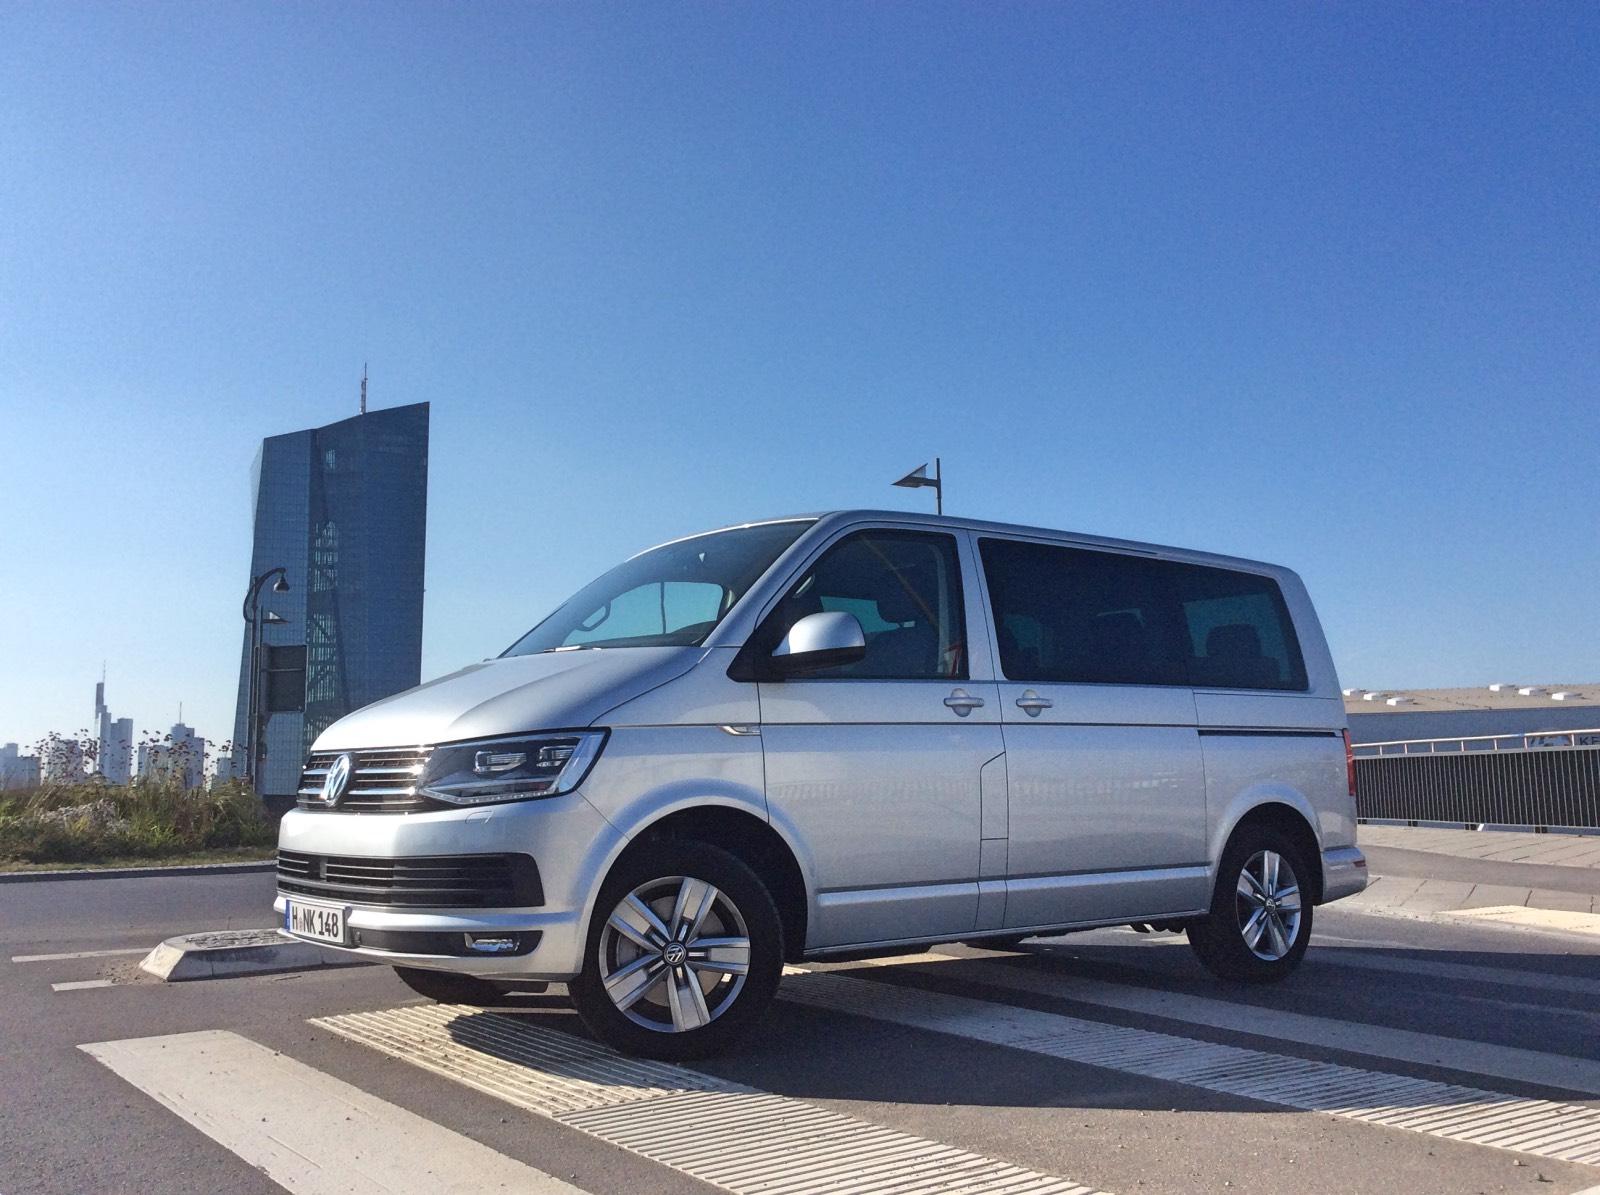 Motiviert Vw Volkswagen T6 Multivan Personen Transporter Schwarz T5 Ab 2 Facelift 2015 .. Auto- & Verkehrsmodelle Modellbau